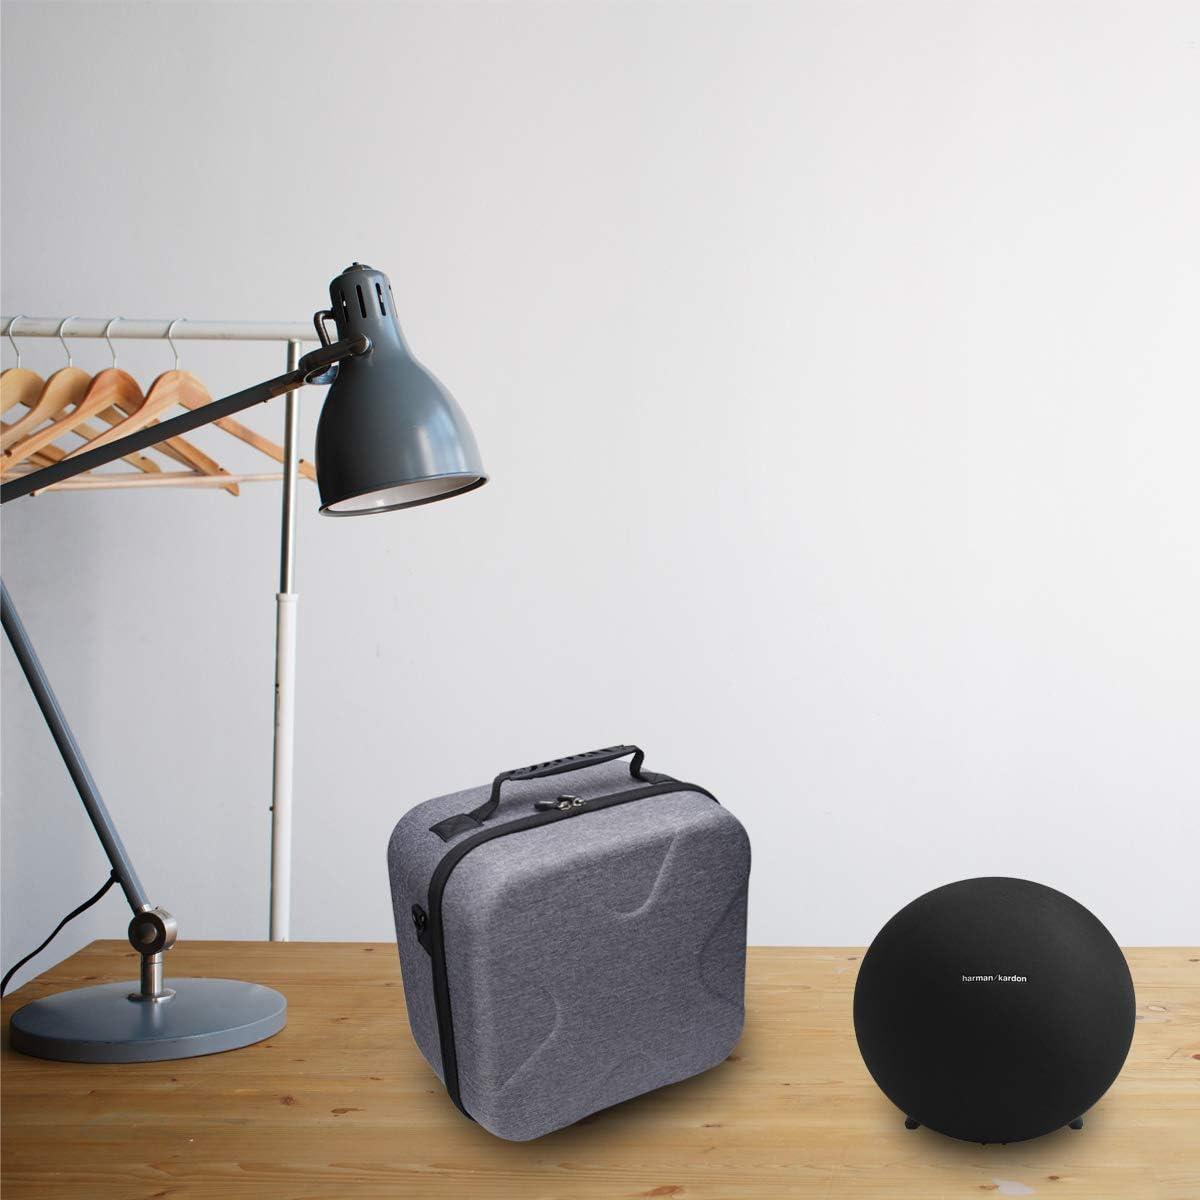 Aproca Hard Storage Carrying Travel Case for Harman Kardon Onyx Studio 4 Wireless Bluetooth Speaker